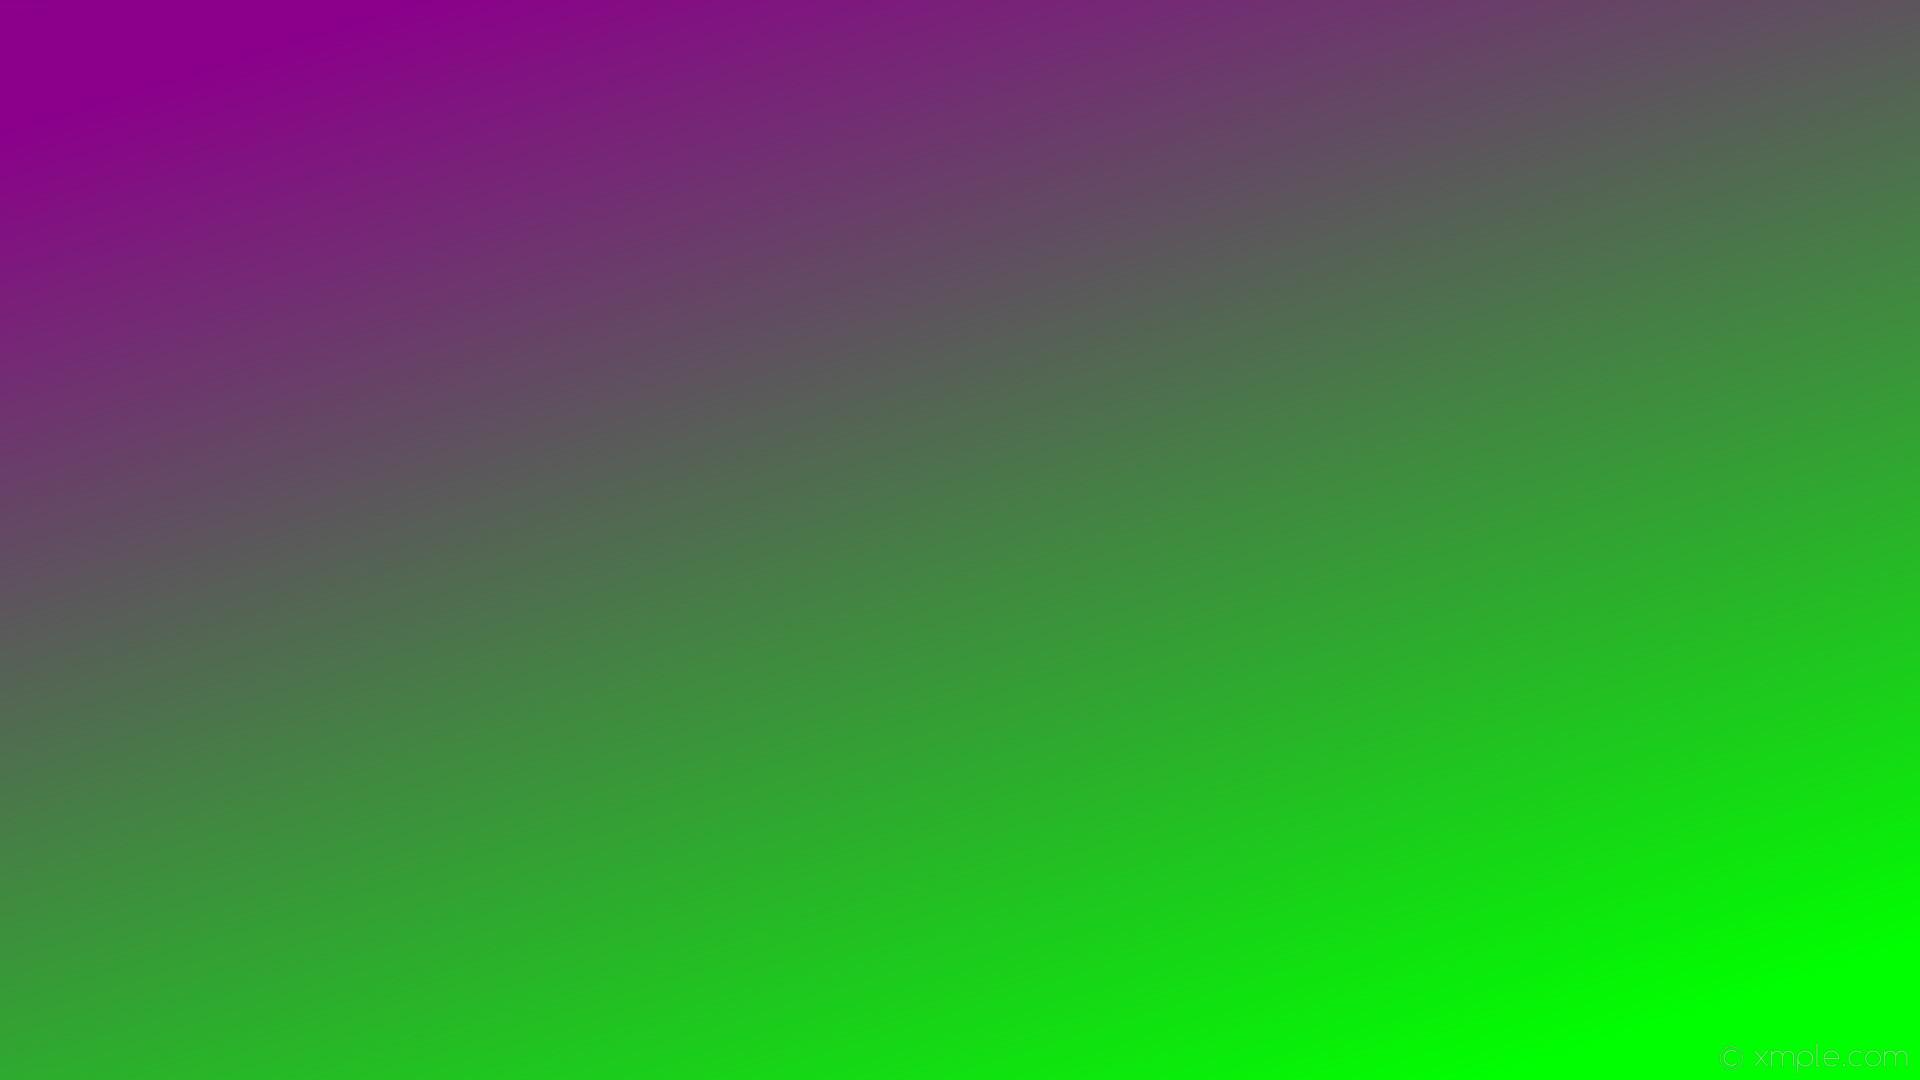 wallpaper green linear gradient purple lime dark magenta #00ff00 #8b008b  315°